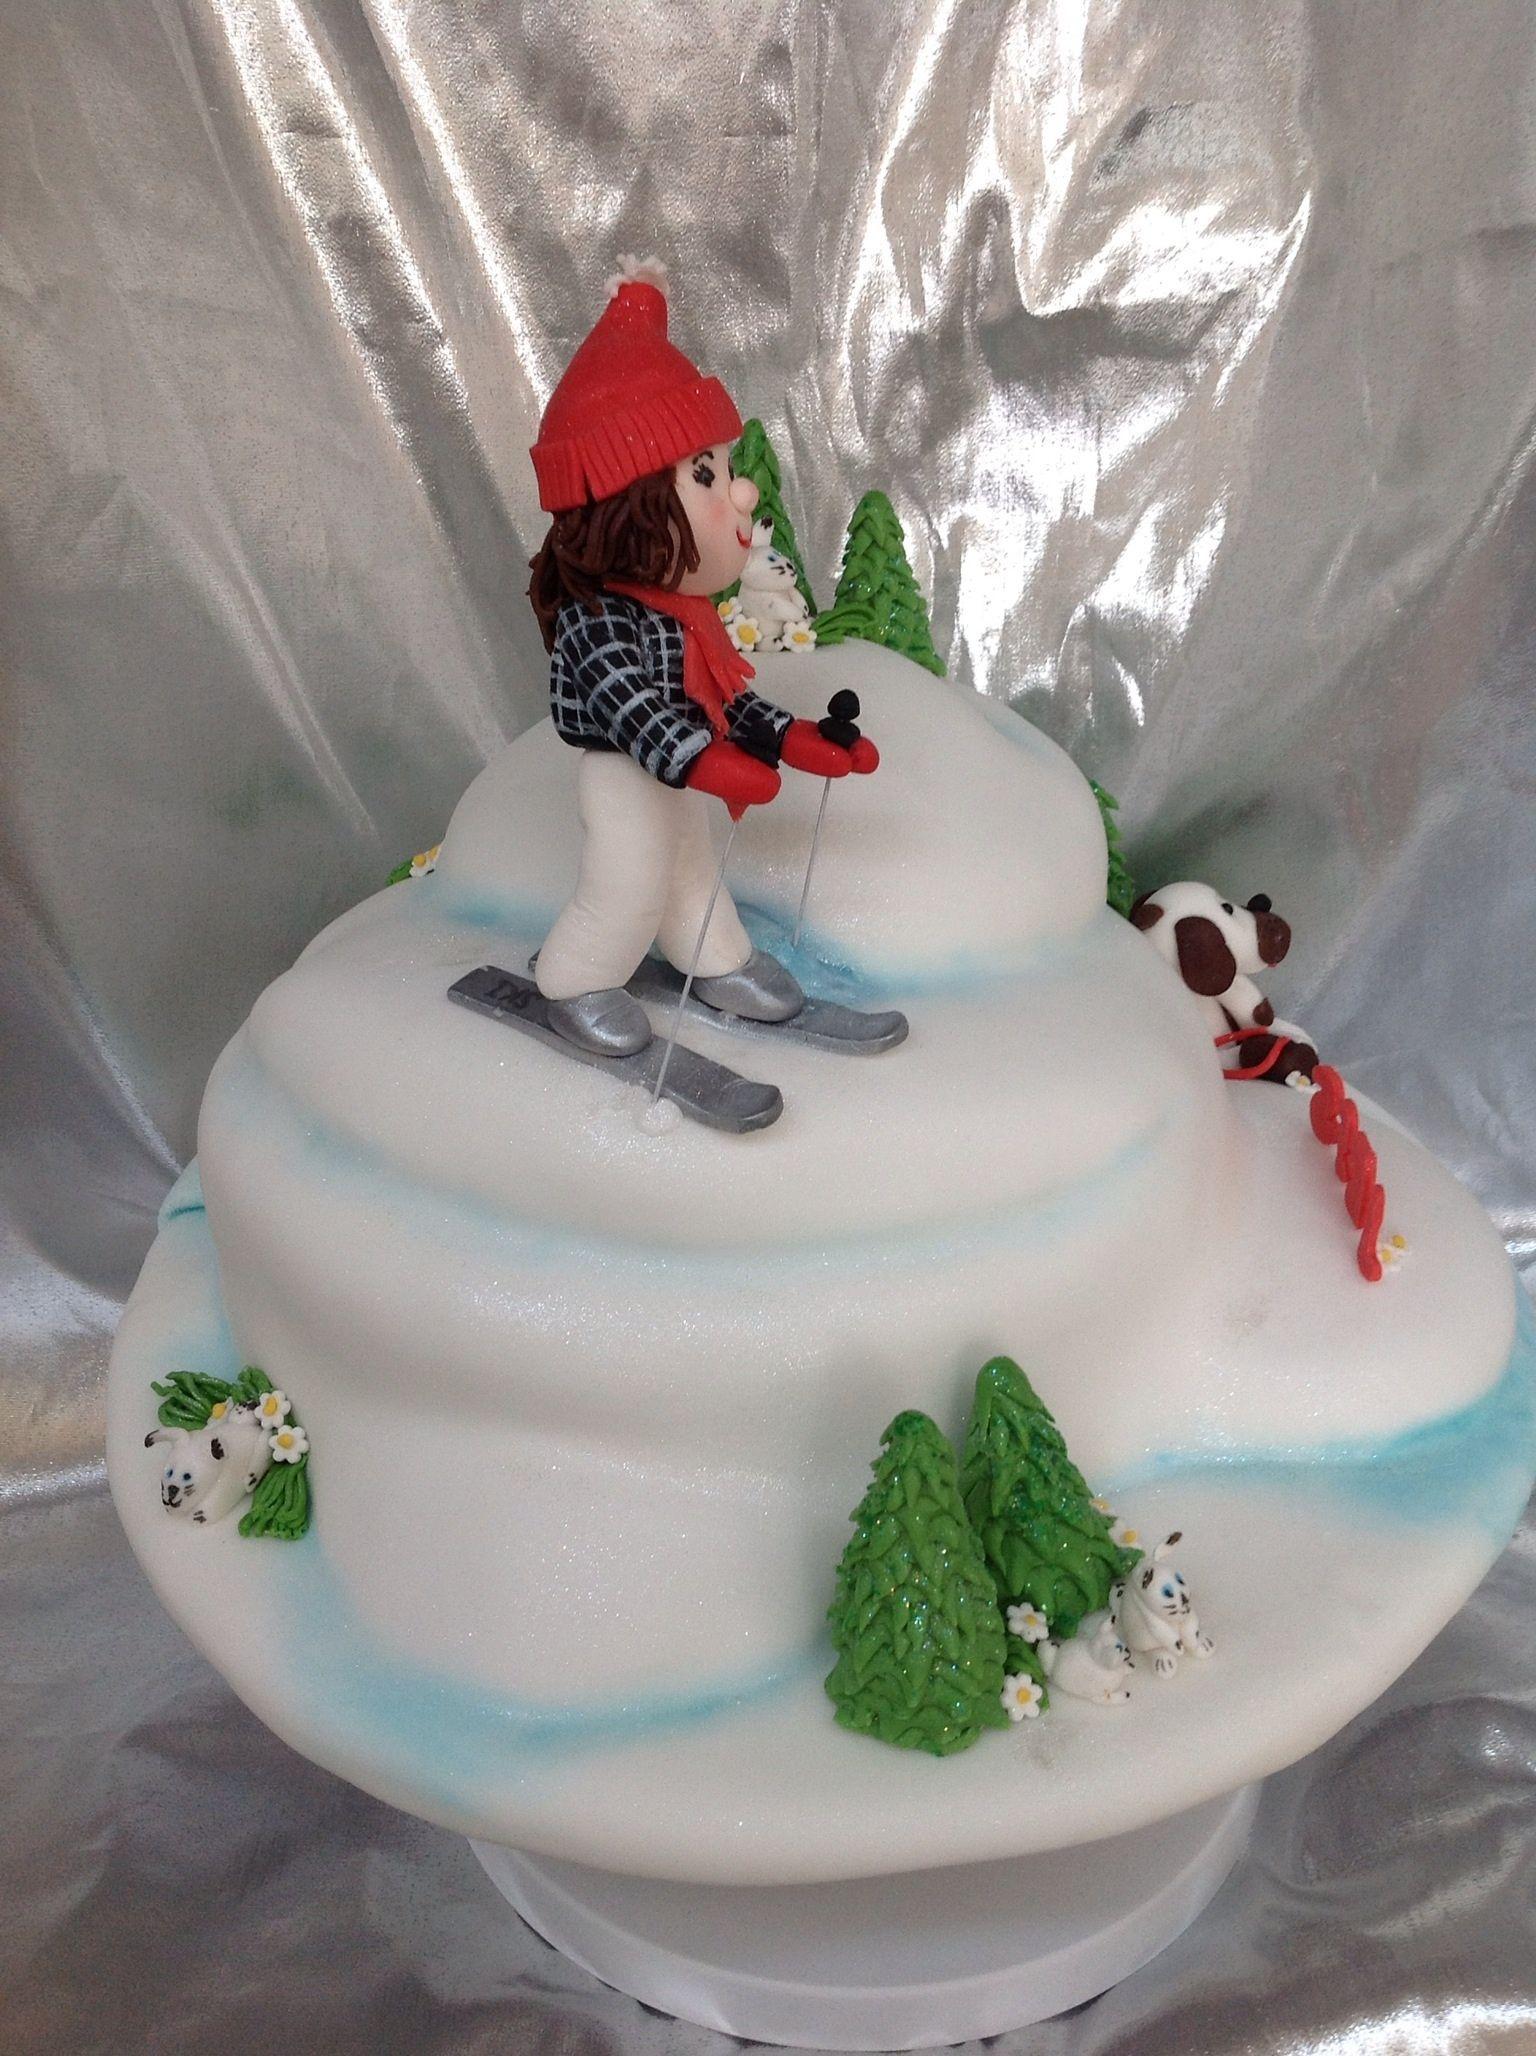 Snow Ski Slope Snow Cakes Pinterest Winter Wonderland Cake